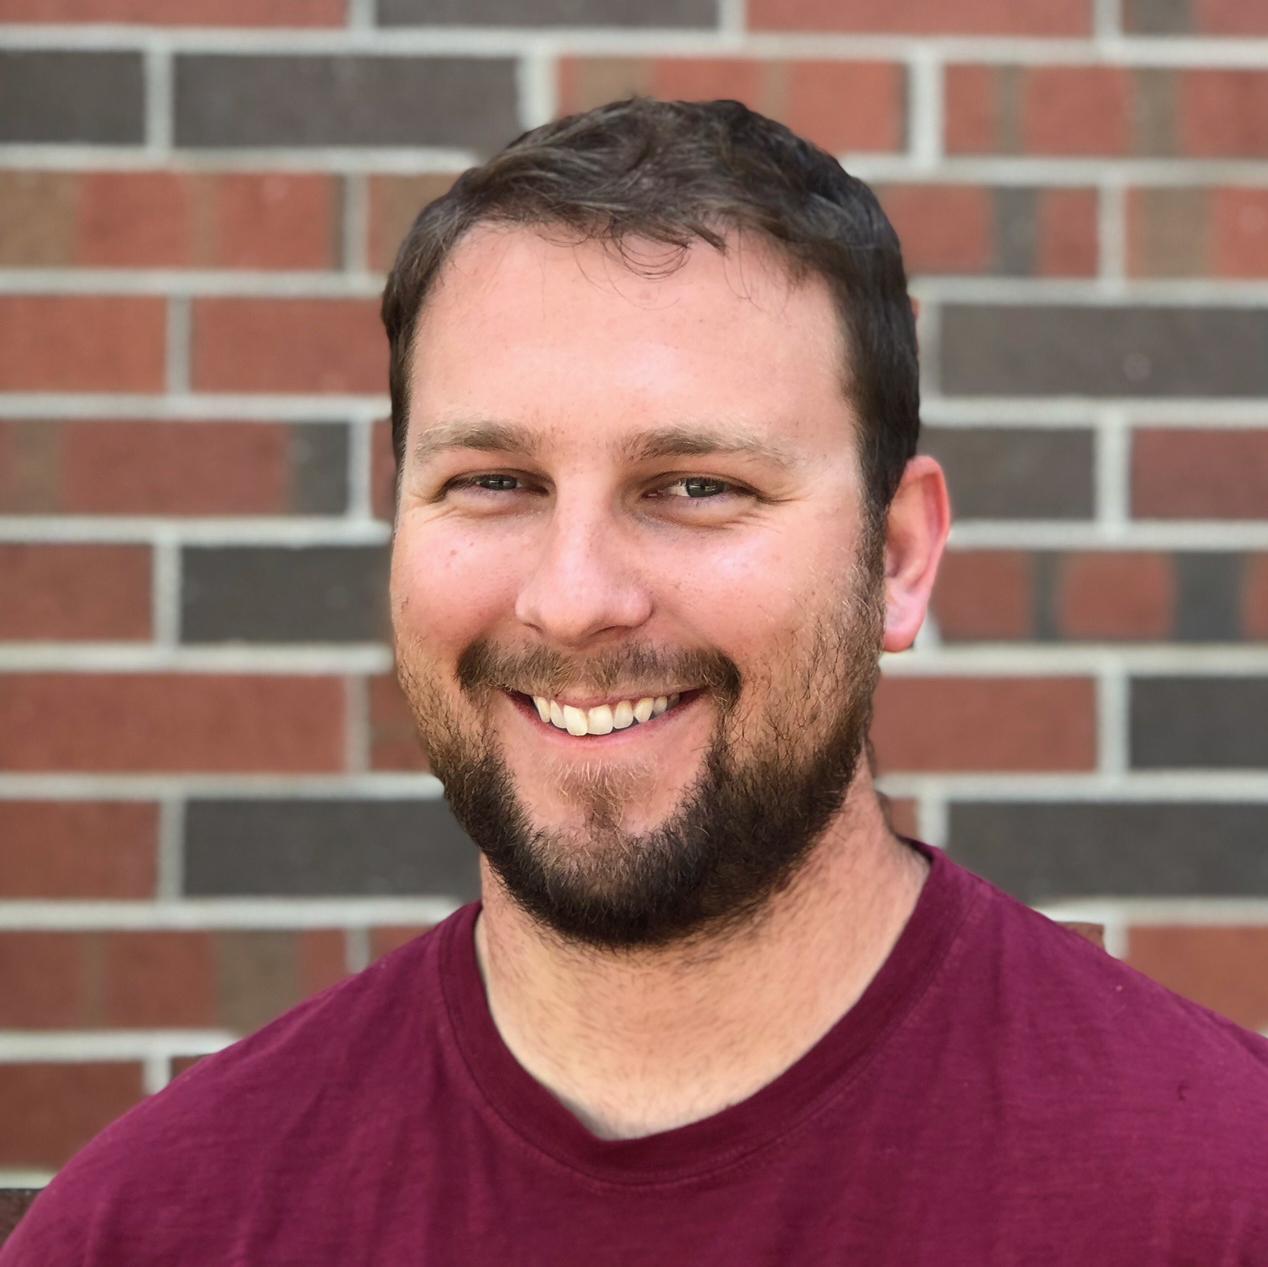 Nick Rutler